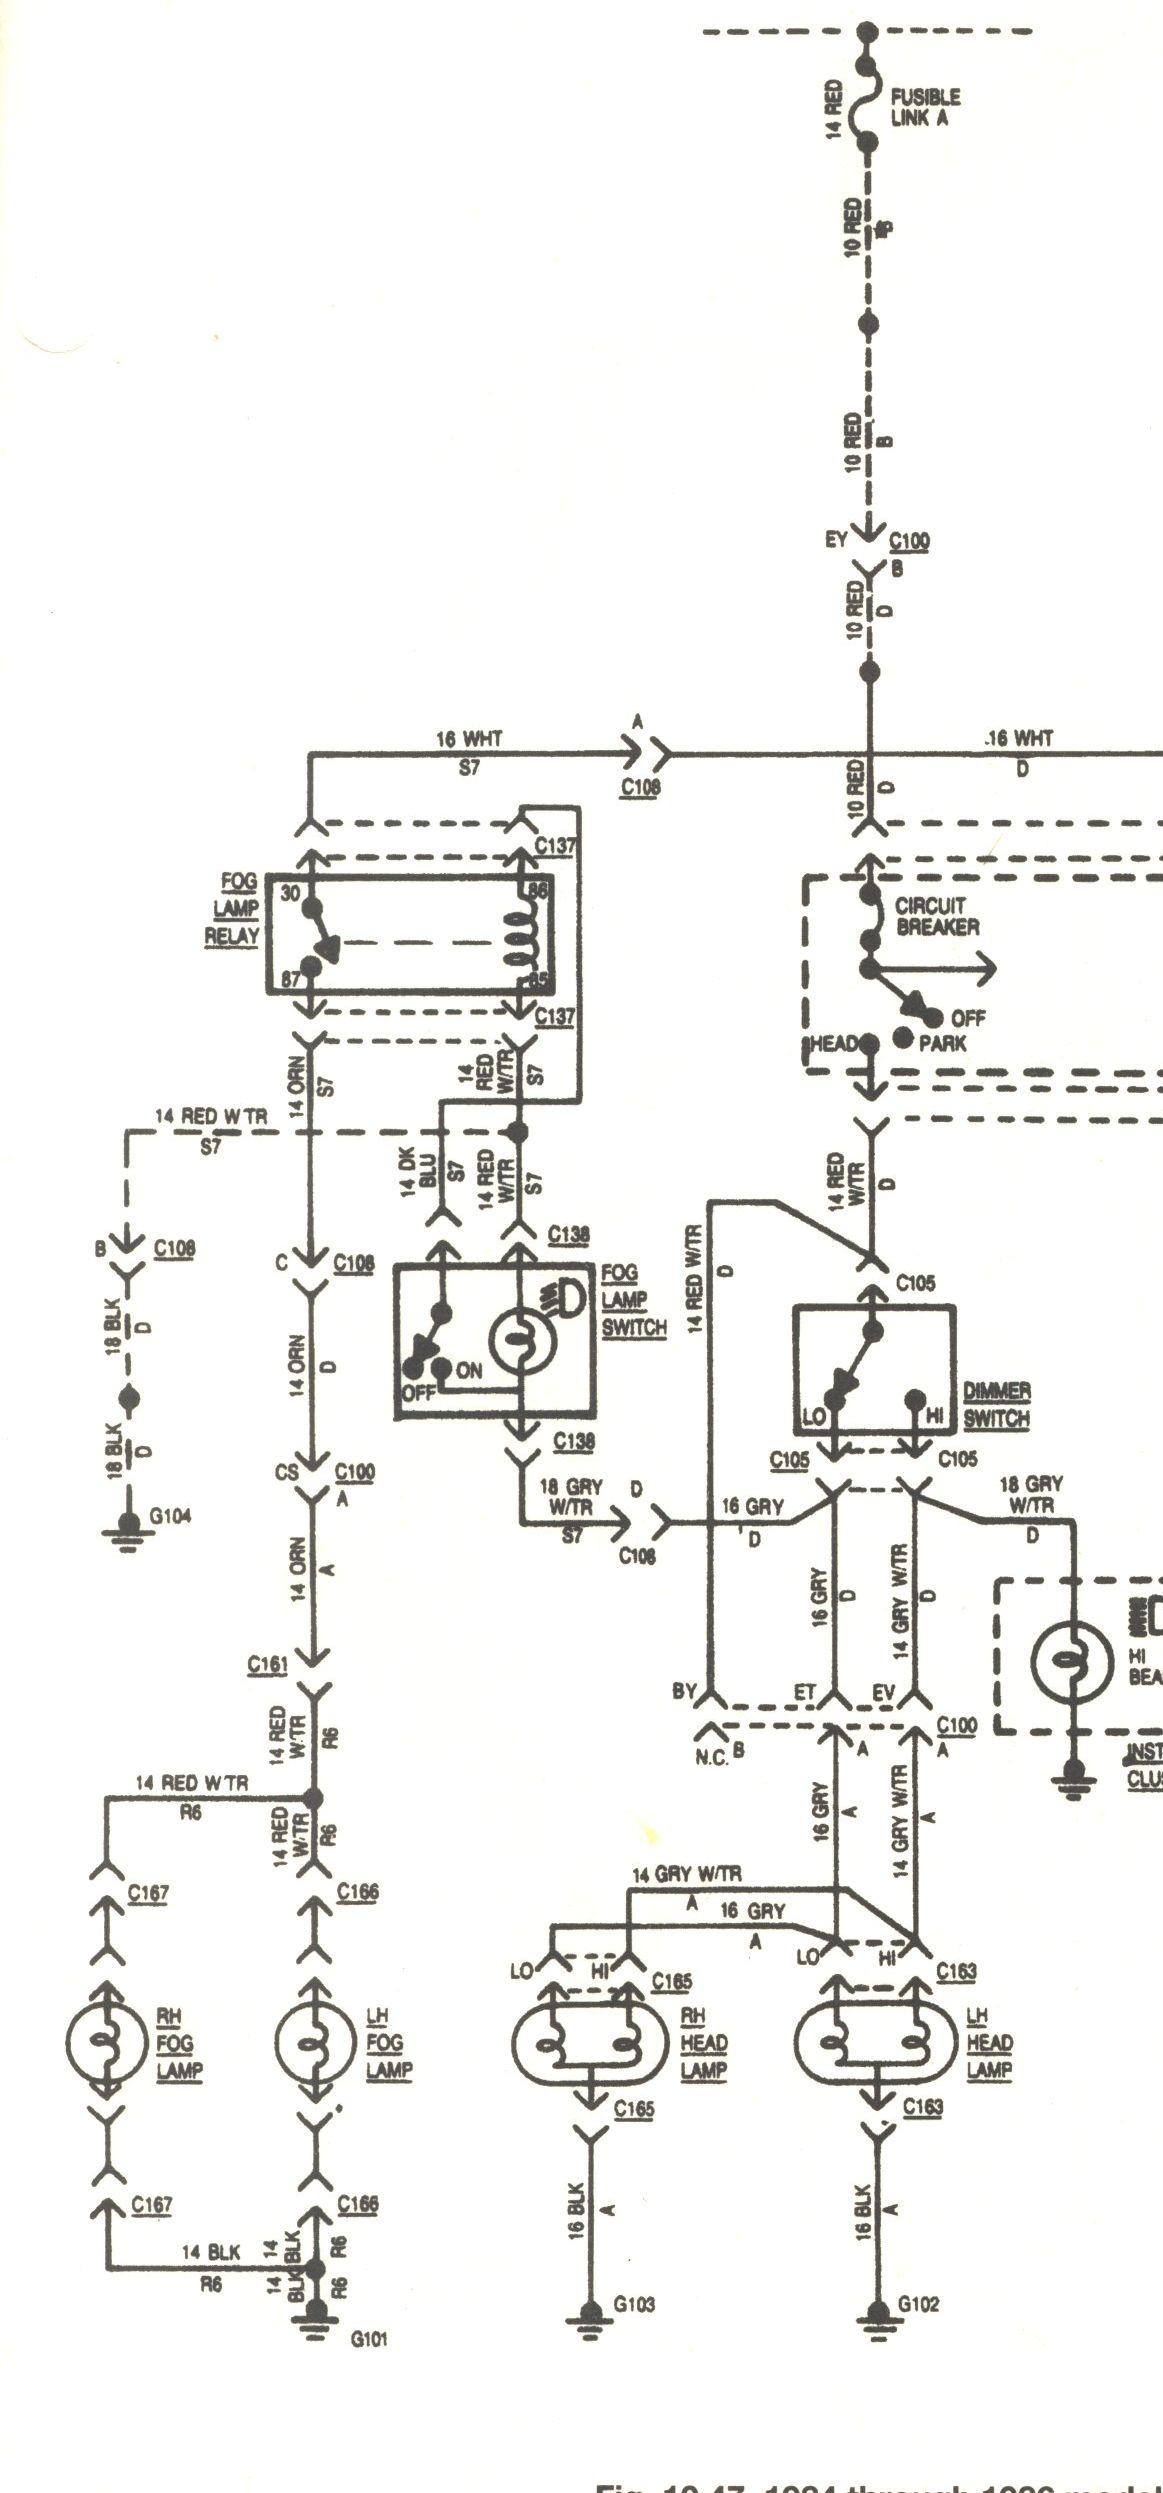 fog light relay wiring diagram on basic tail light wiring diagram